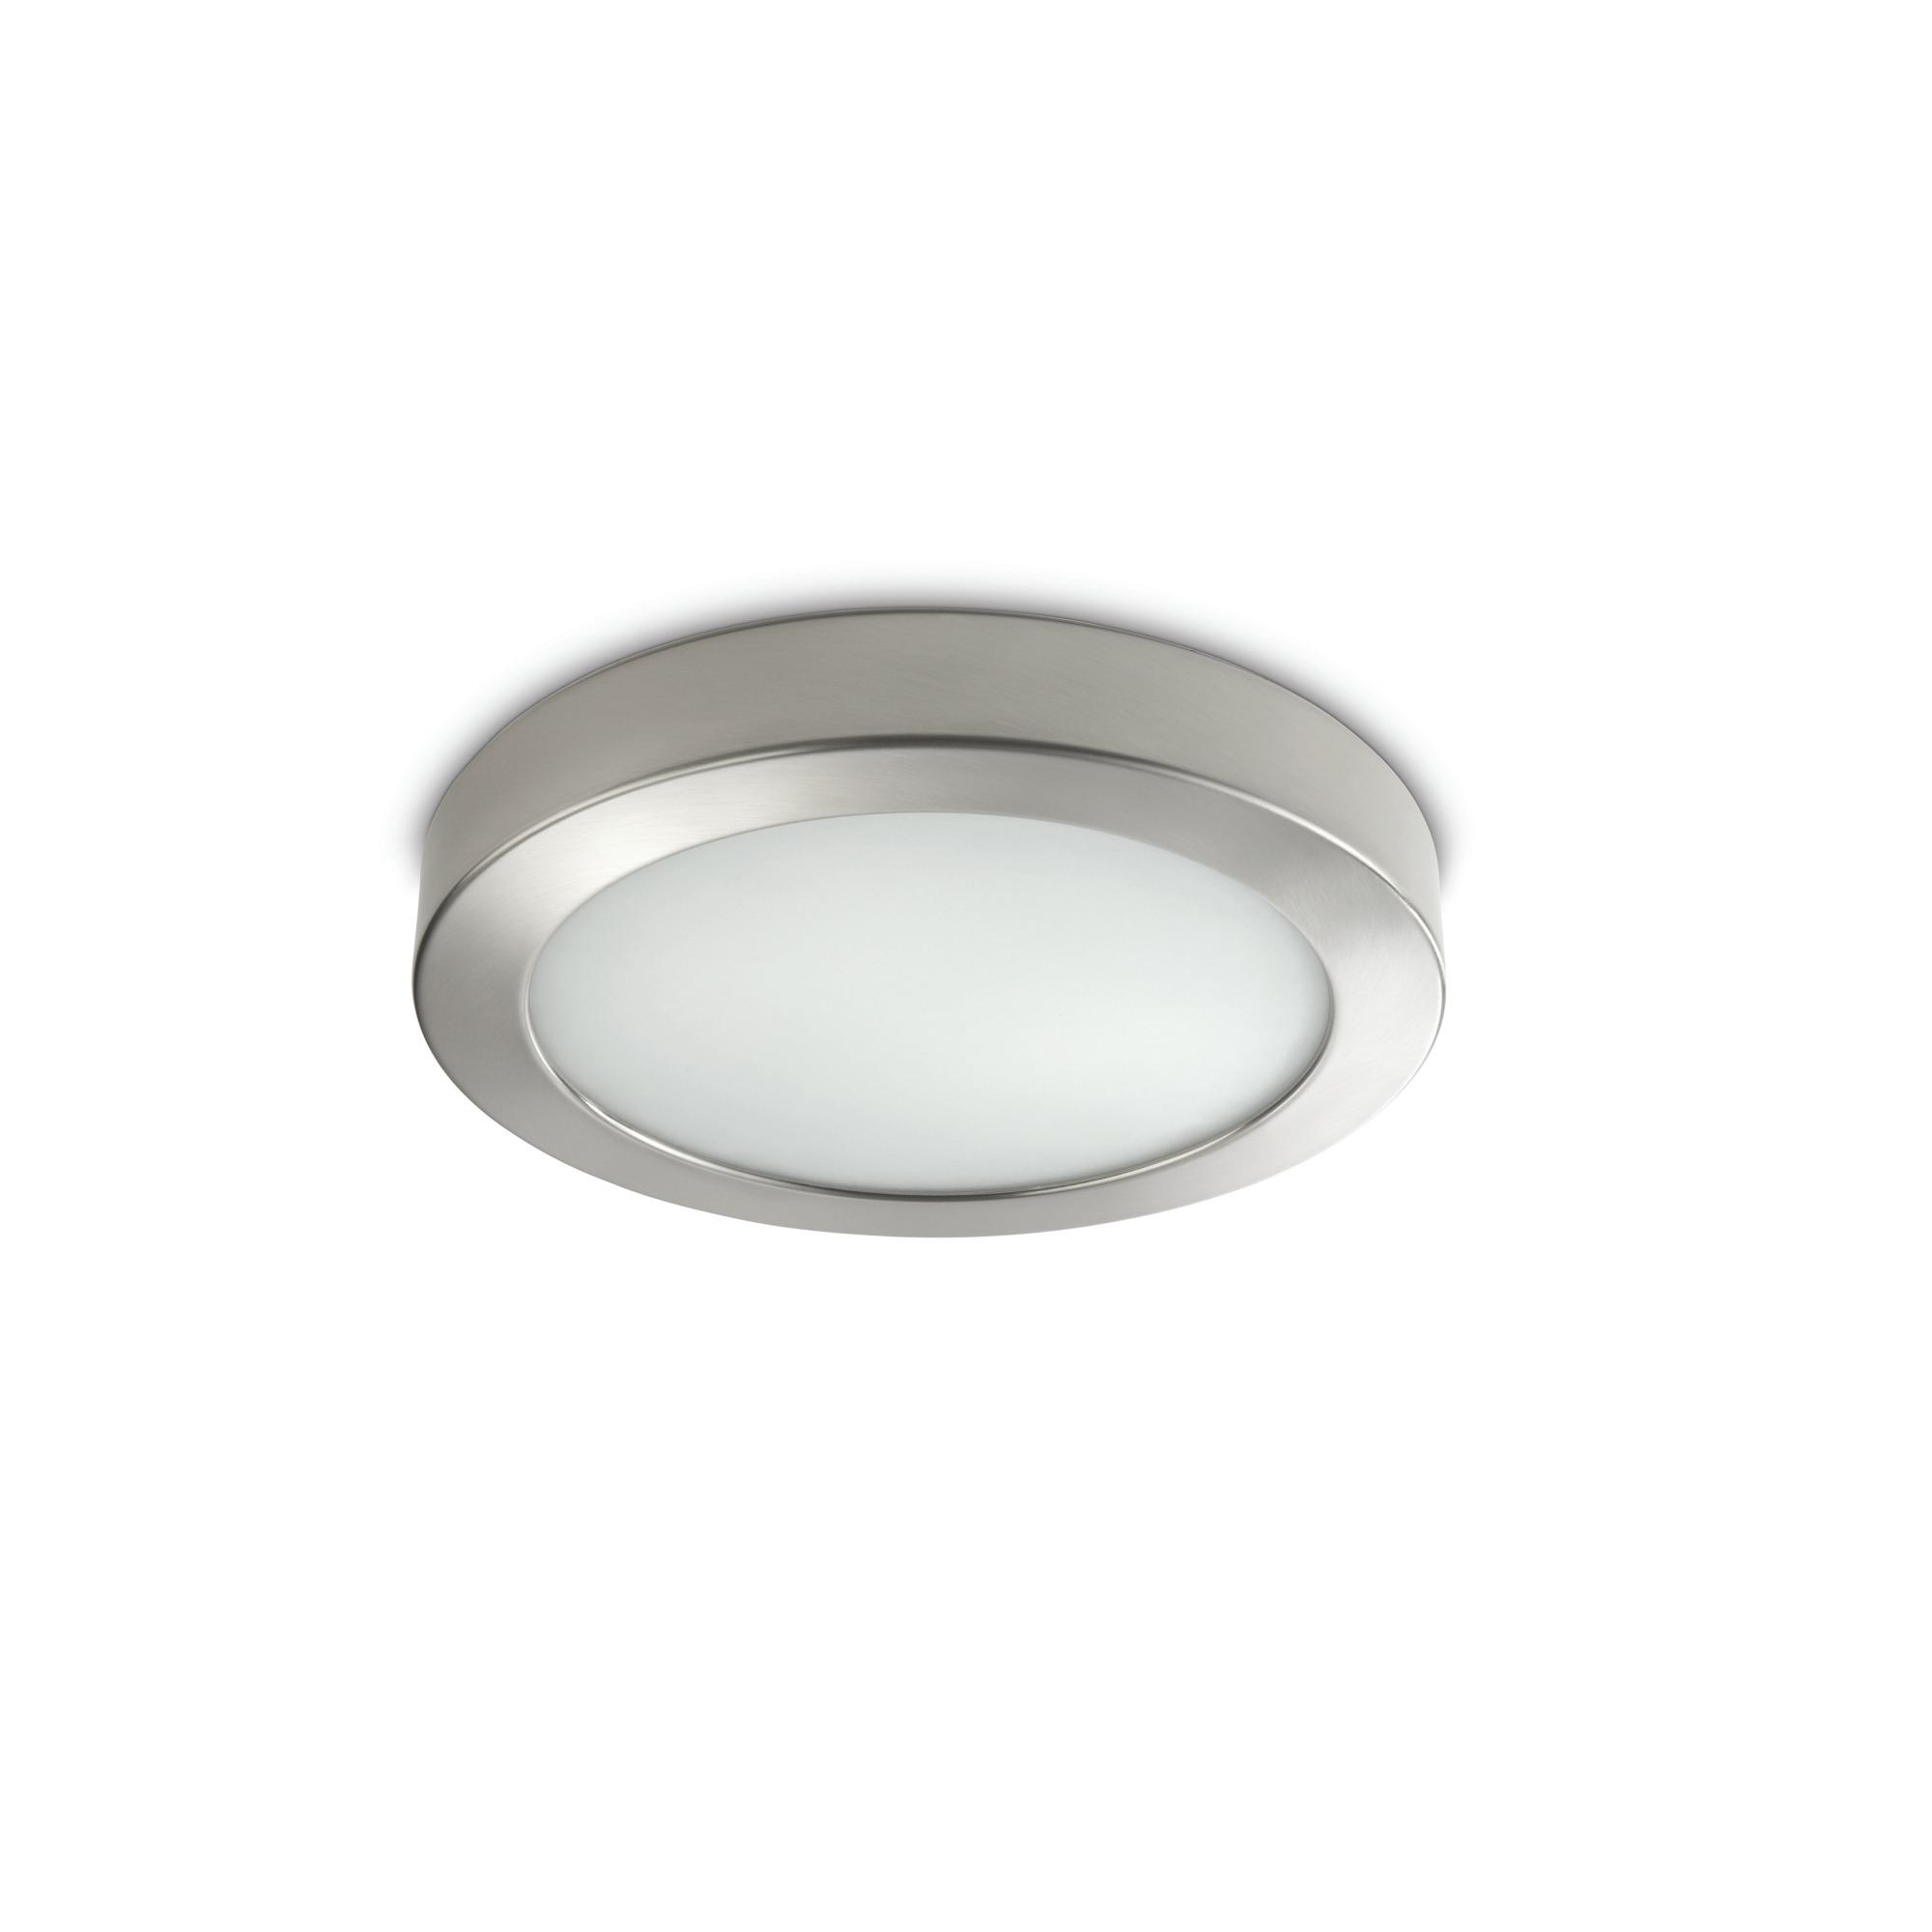 energie A+, Plafondlamp myLiving metaal 1-lichtbron, Philips Ledino